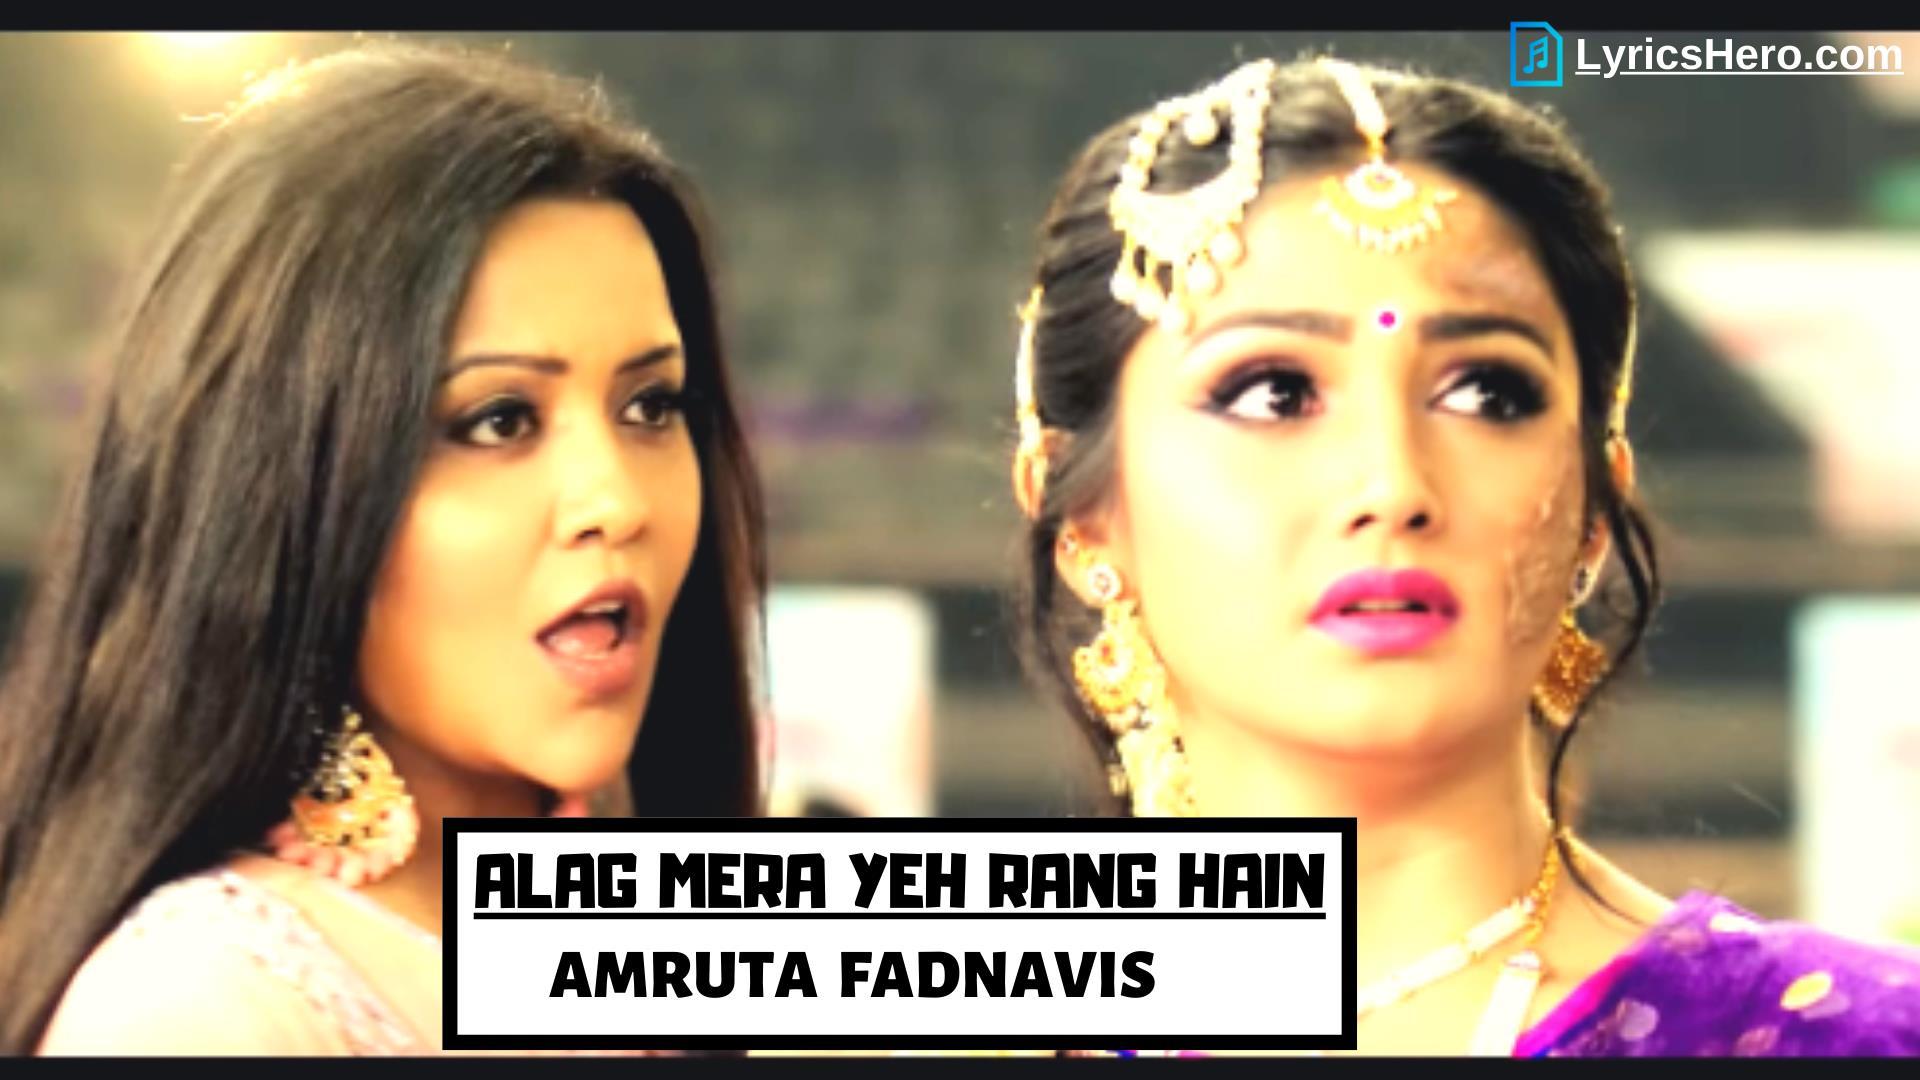 Alag Mera Yeh Rang Hain Lyrics In Hindi, Alag Mera Yeh Rang Hain Lyrics, Alag Mera Yeh Rang Hain Song Lyrics, Alag Mera Yeh Rang Hain Lyrics Amruta Fadnavis